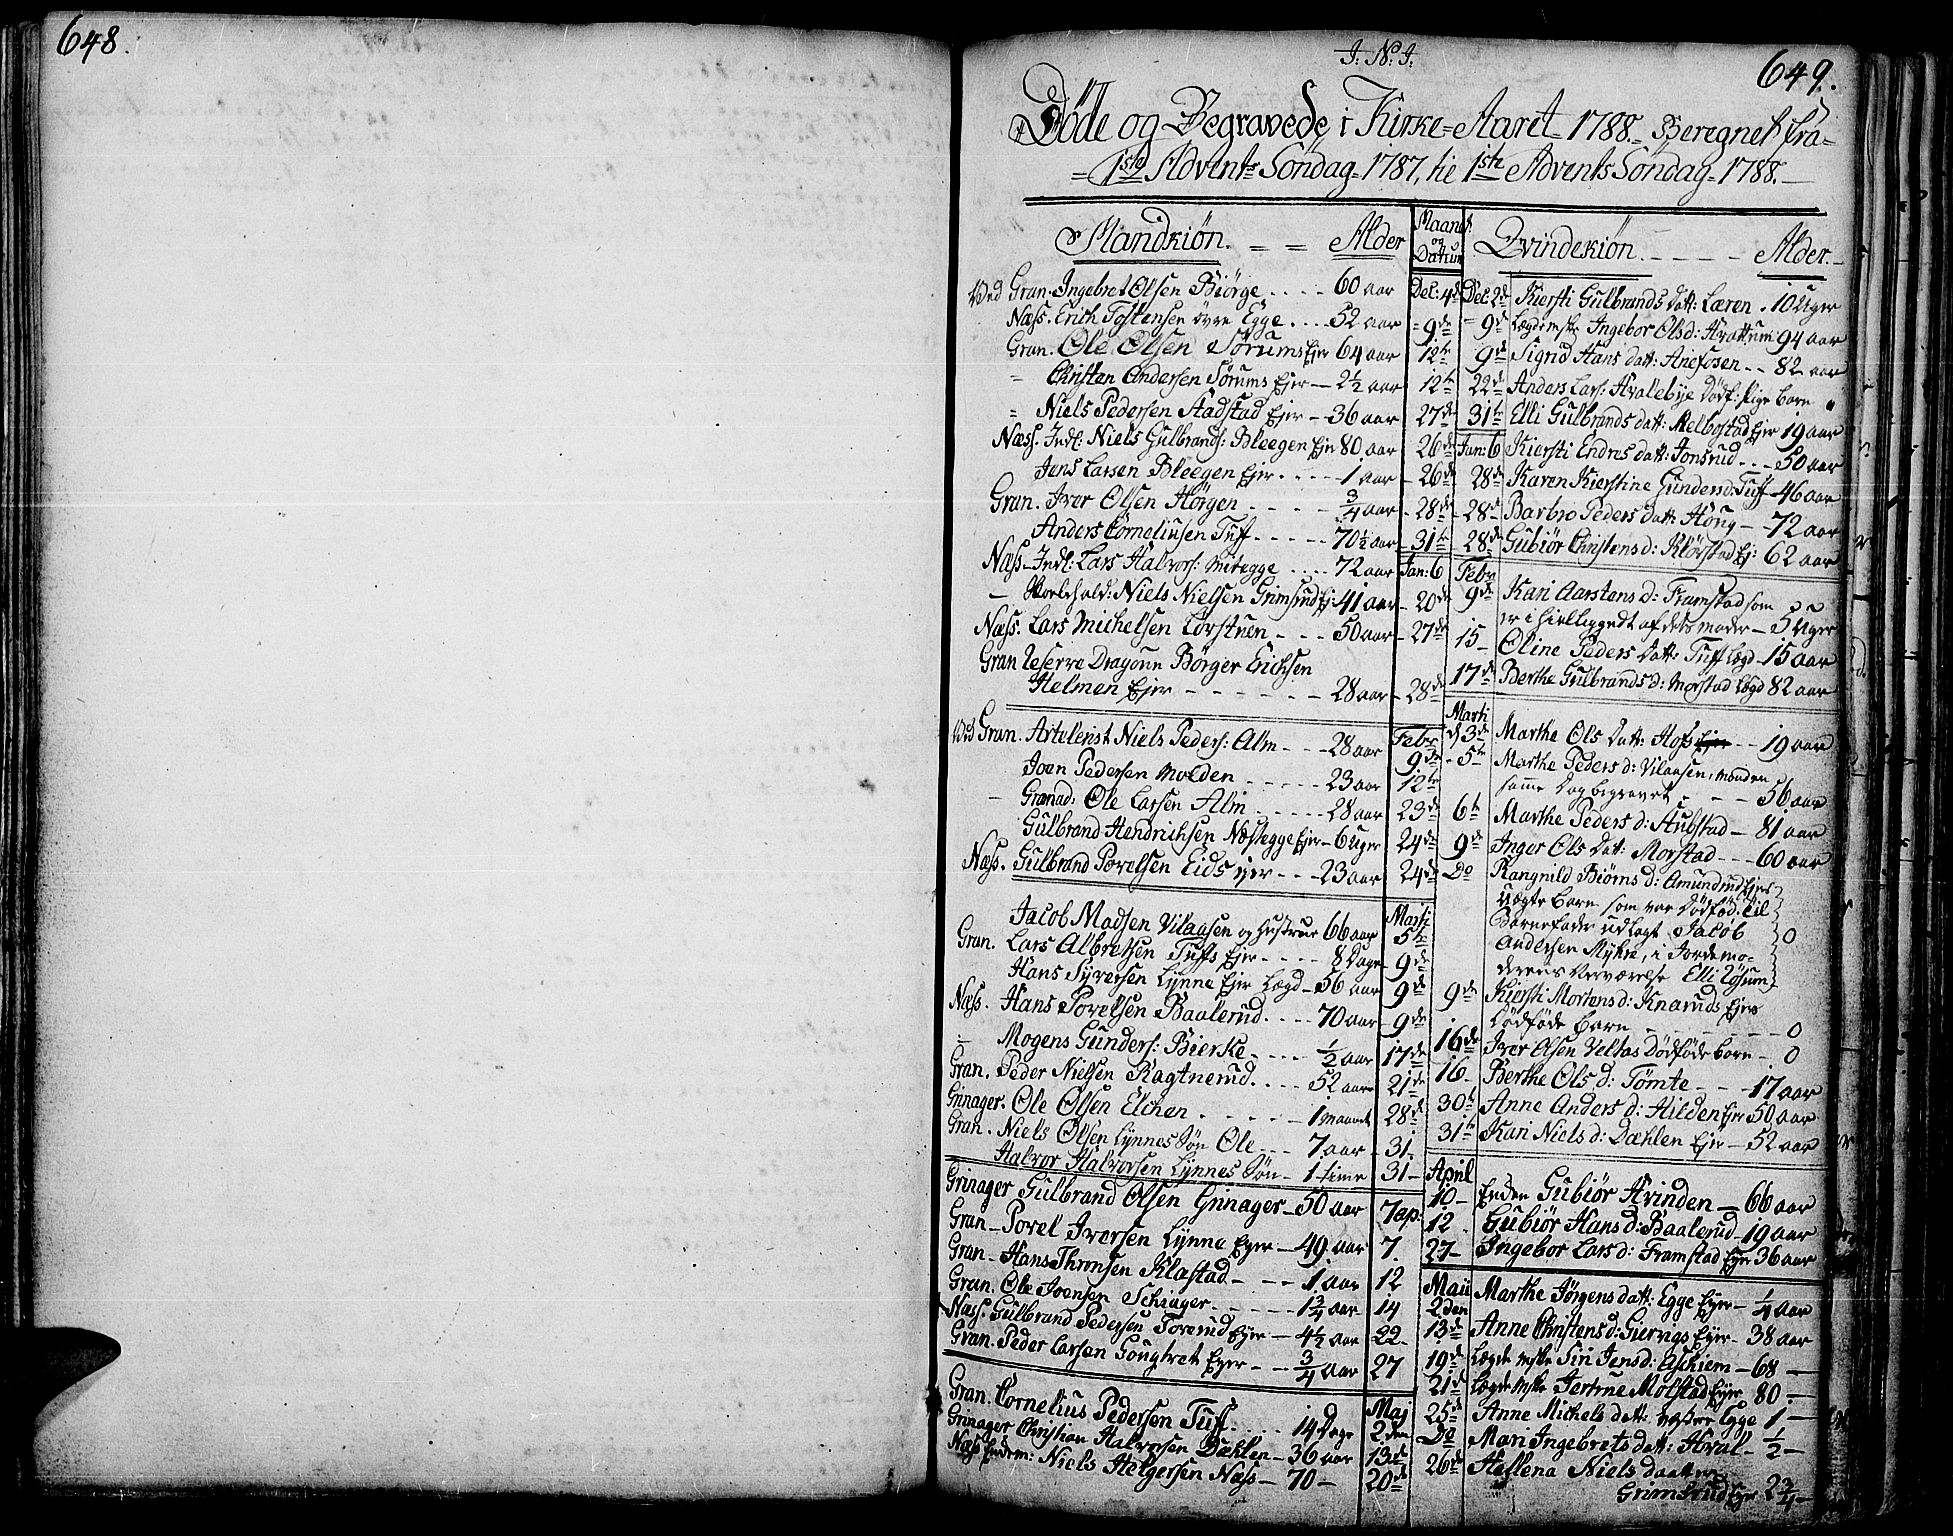 SAH, Gran prestekontor, Parish register (official) no. 6, 1787-1824, p. 648-649